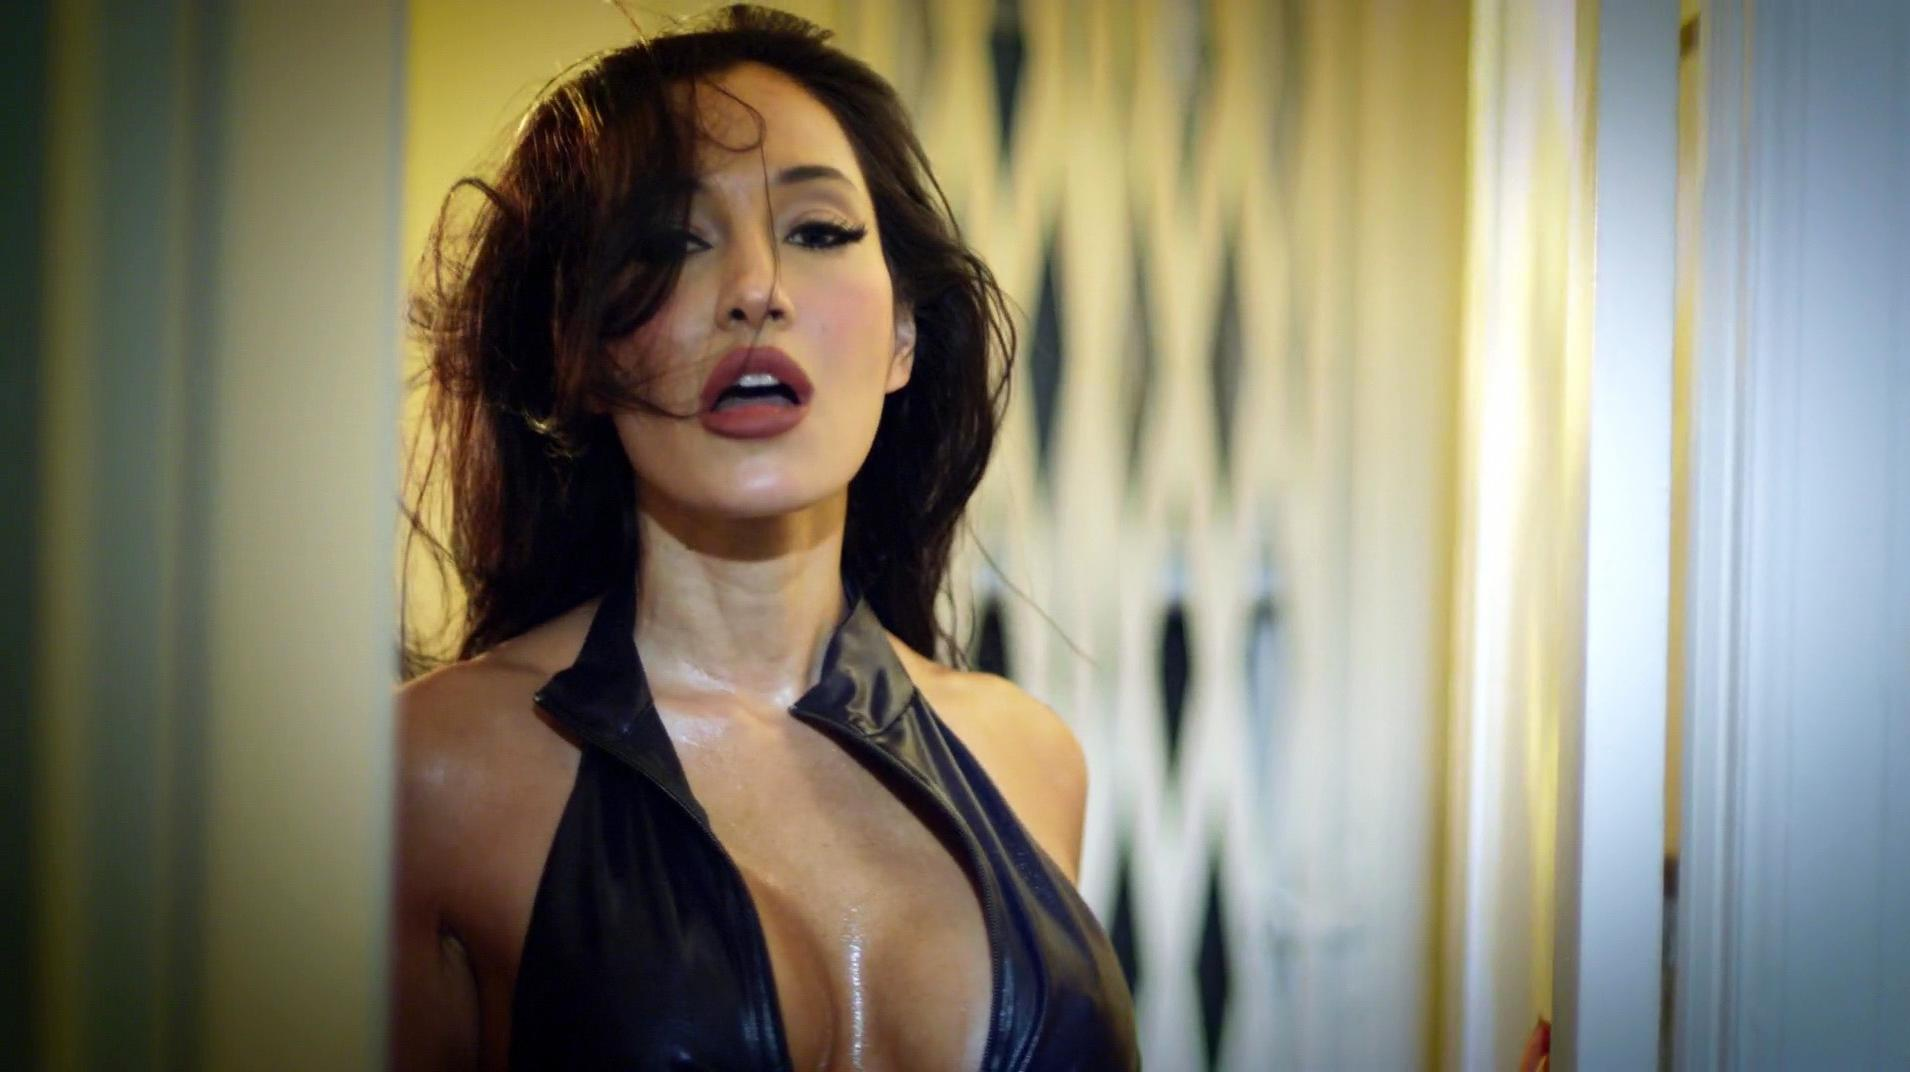 Kea Ho sexy, Genevieve Hudson-Price nude - Condemned (2015)